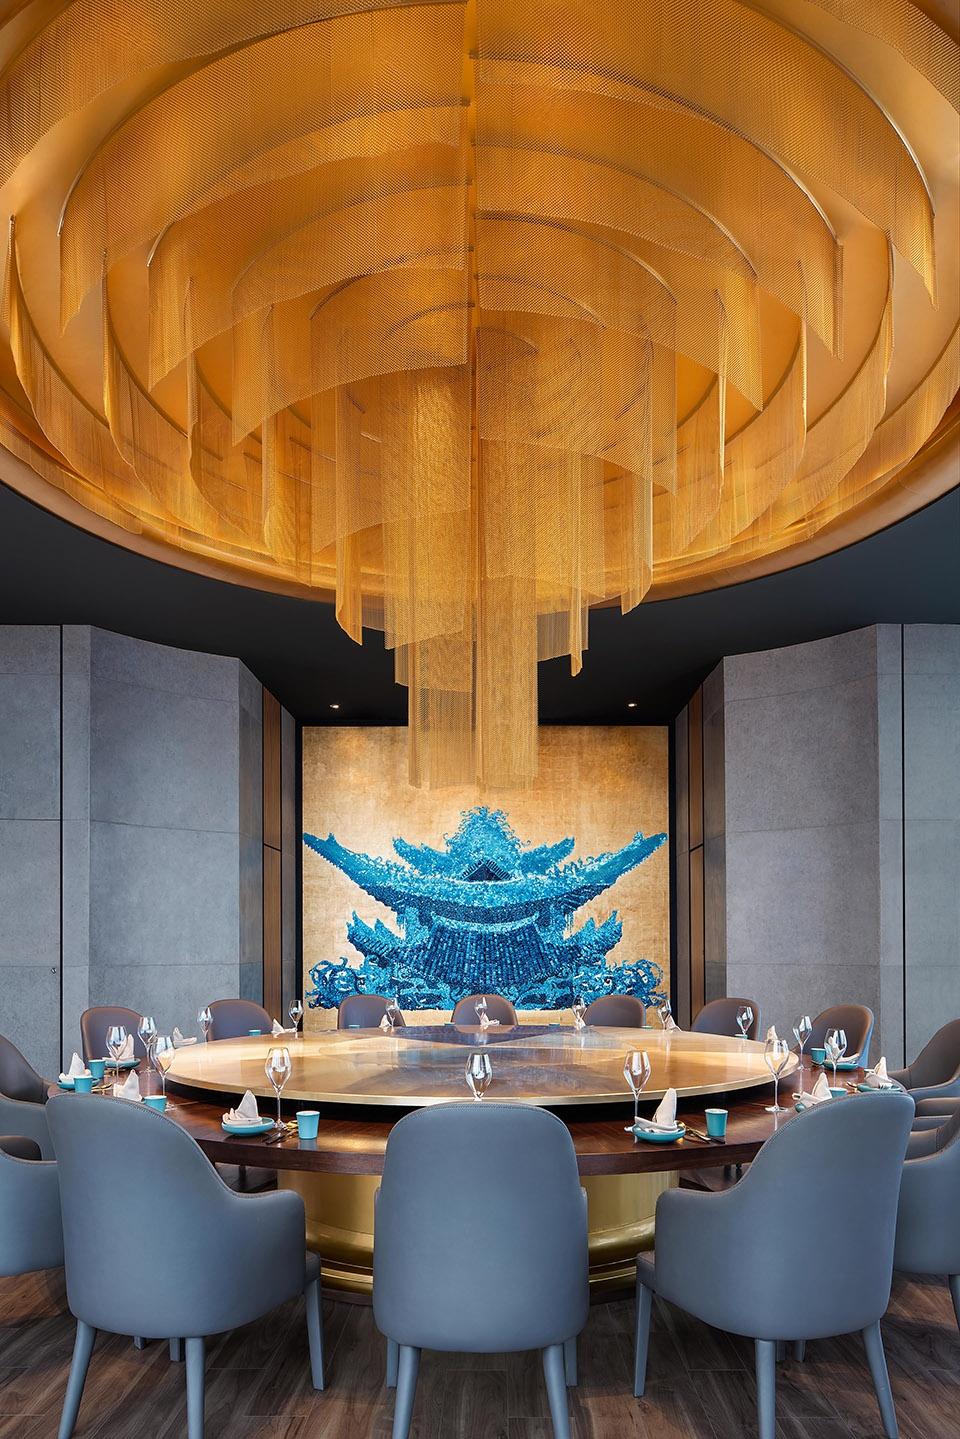 007-the-top-of-cloud-restaurant-china-by-rsaaburo-ziyu-zhuang-960x1439.jpg